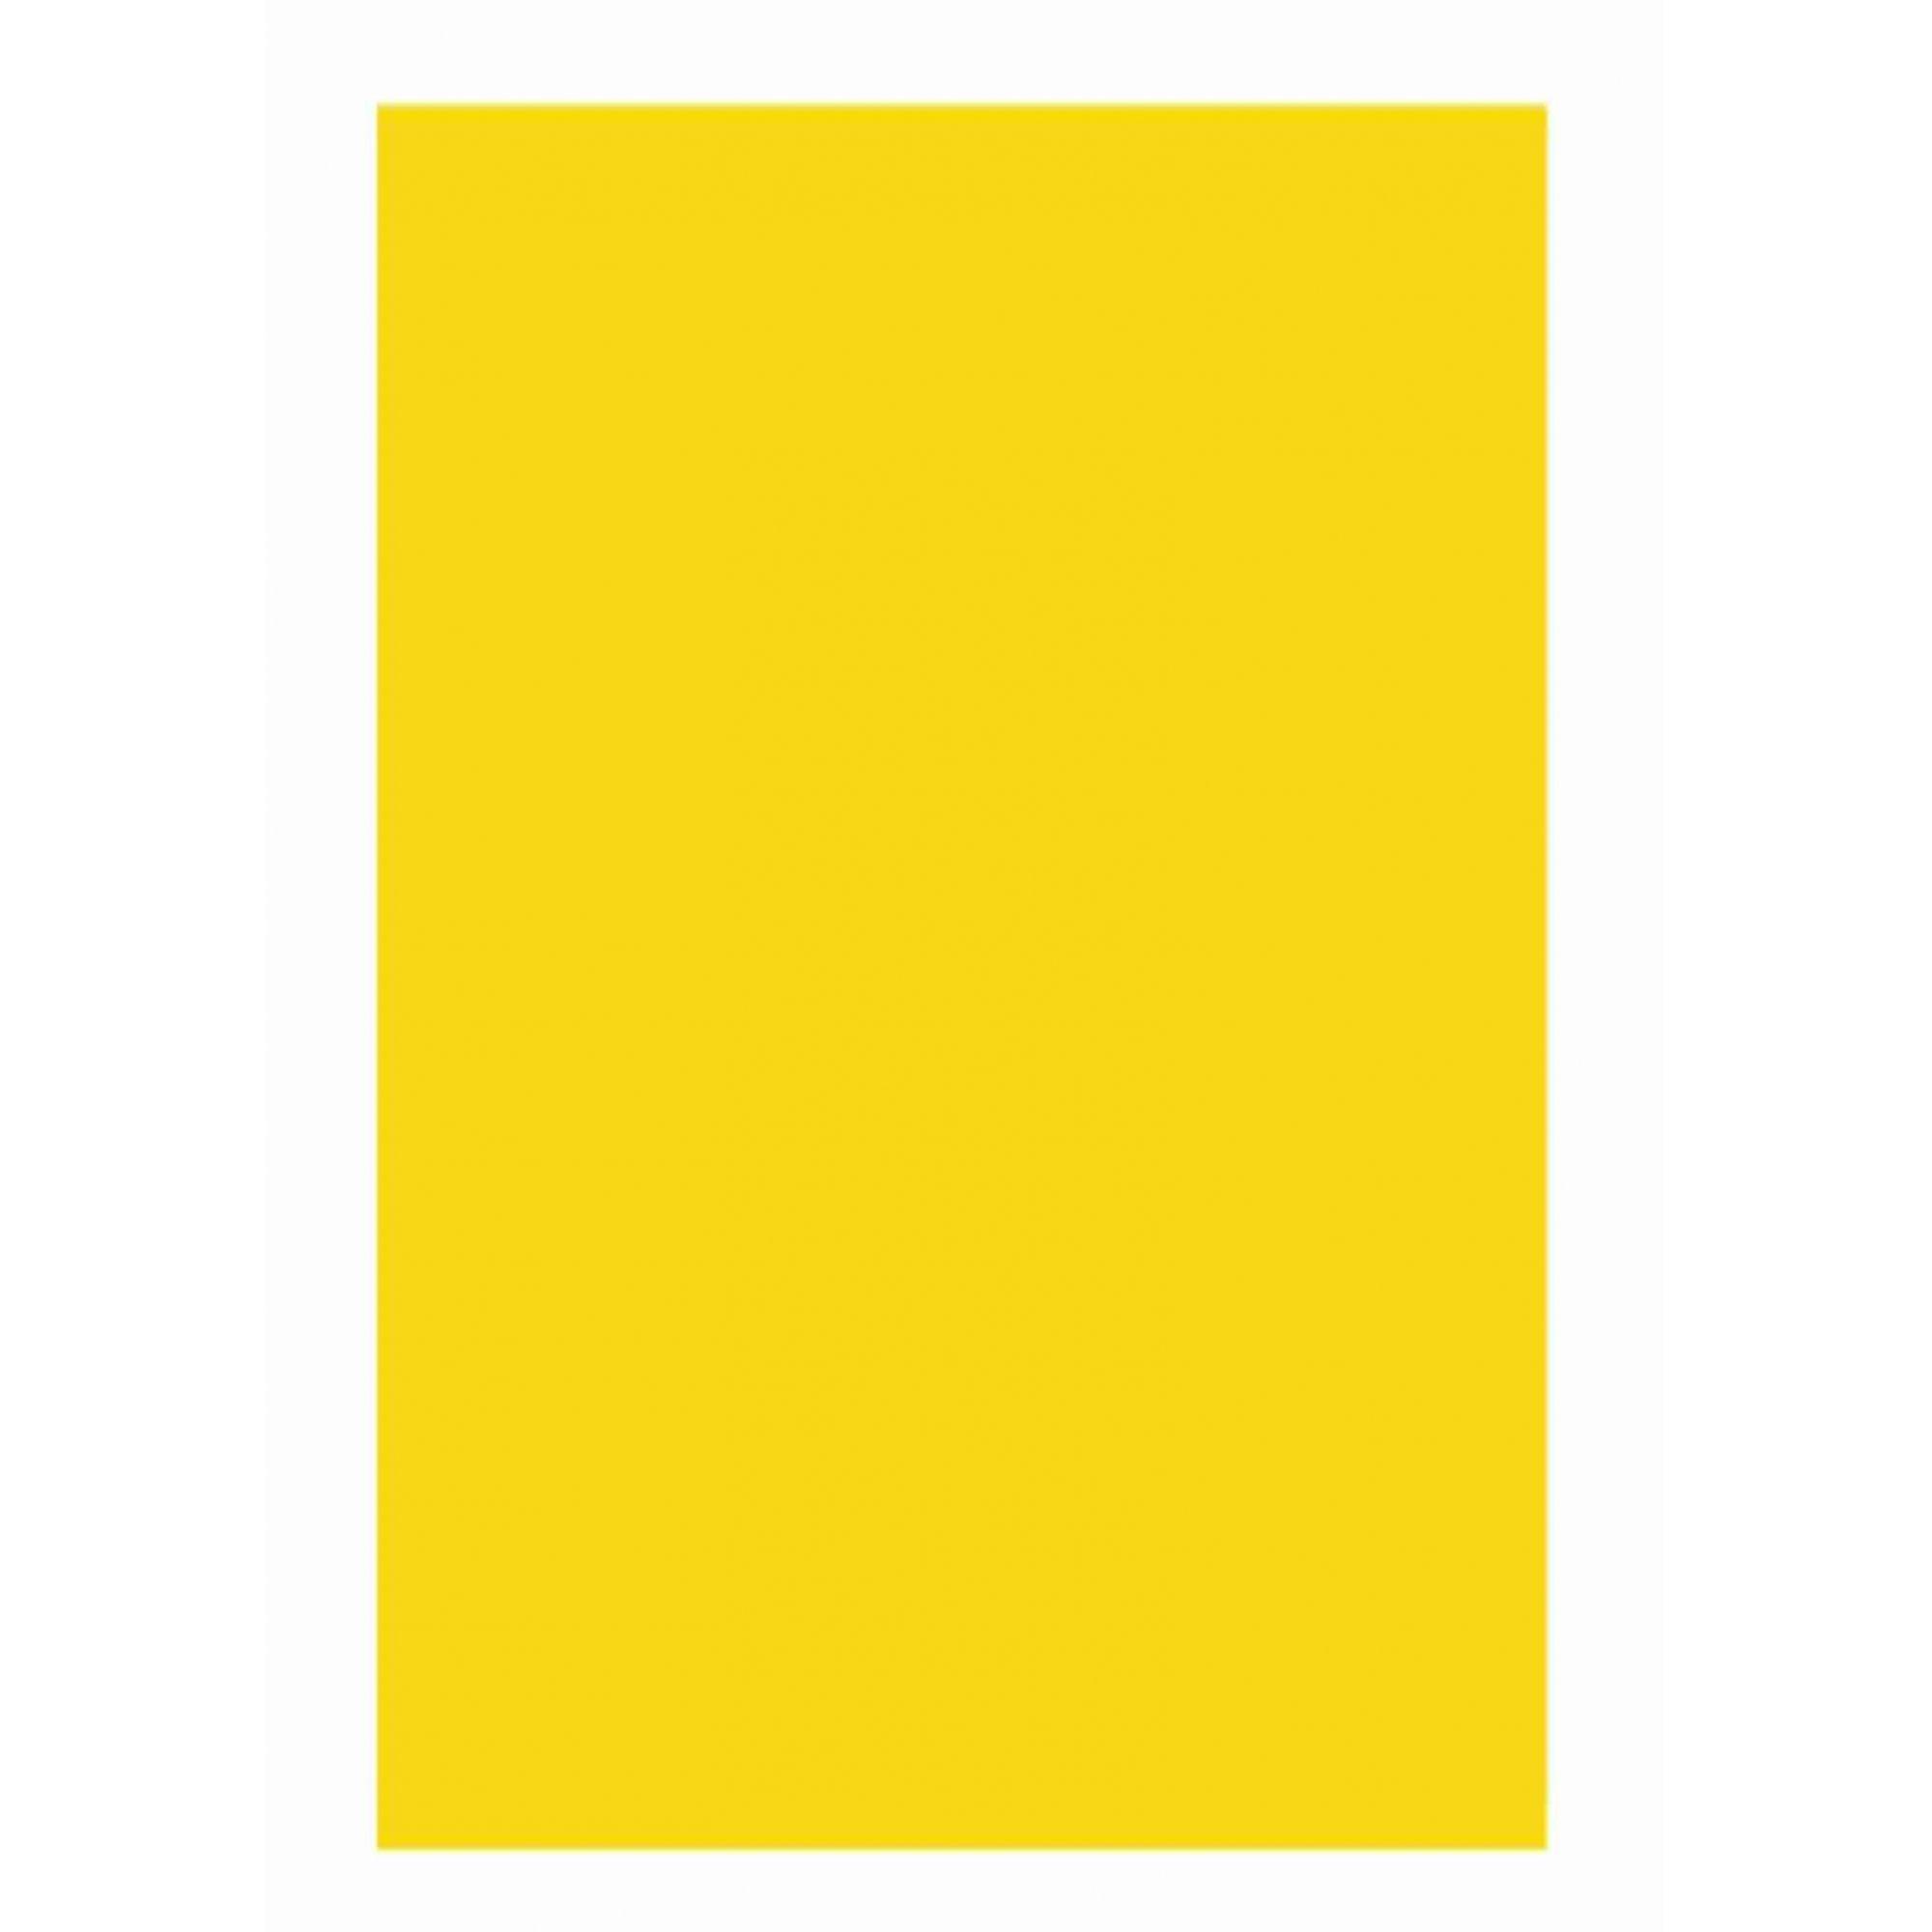 Folha Colorida Amarelo Cádmio 11307 - Vidro